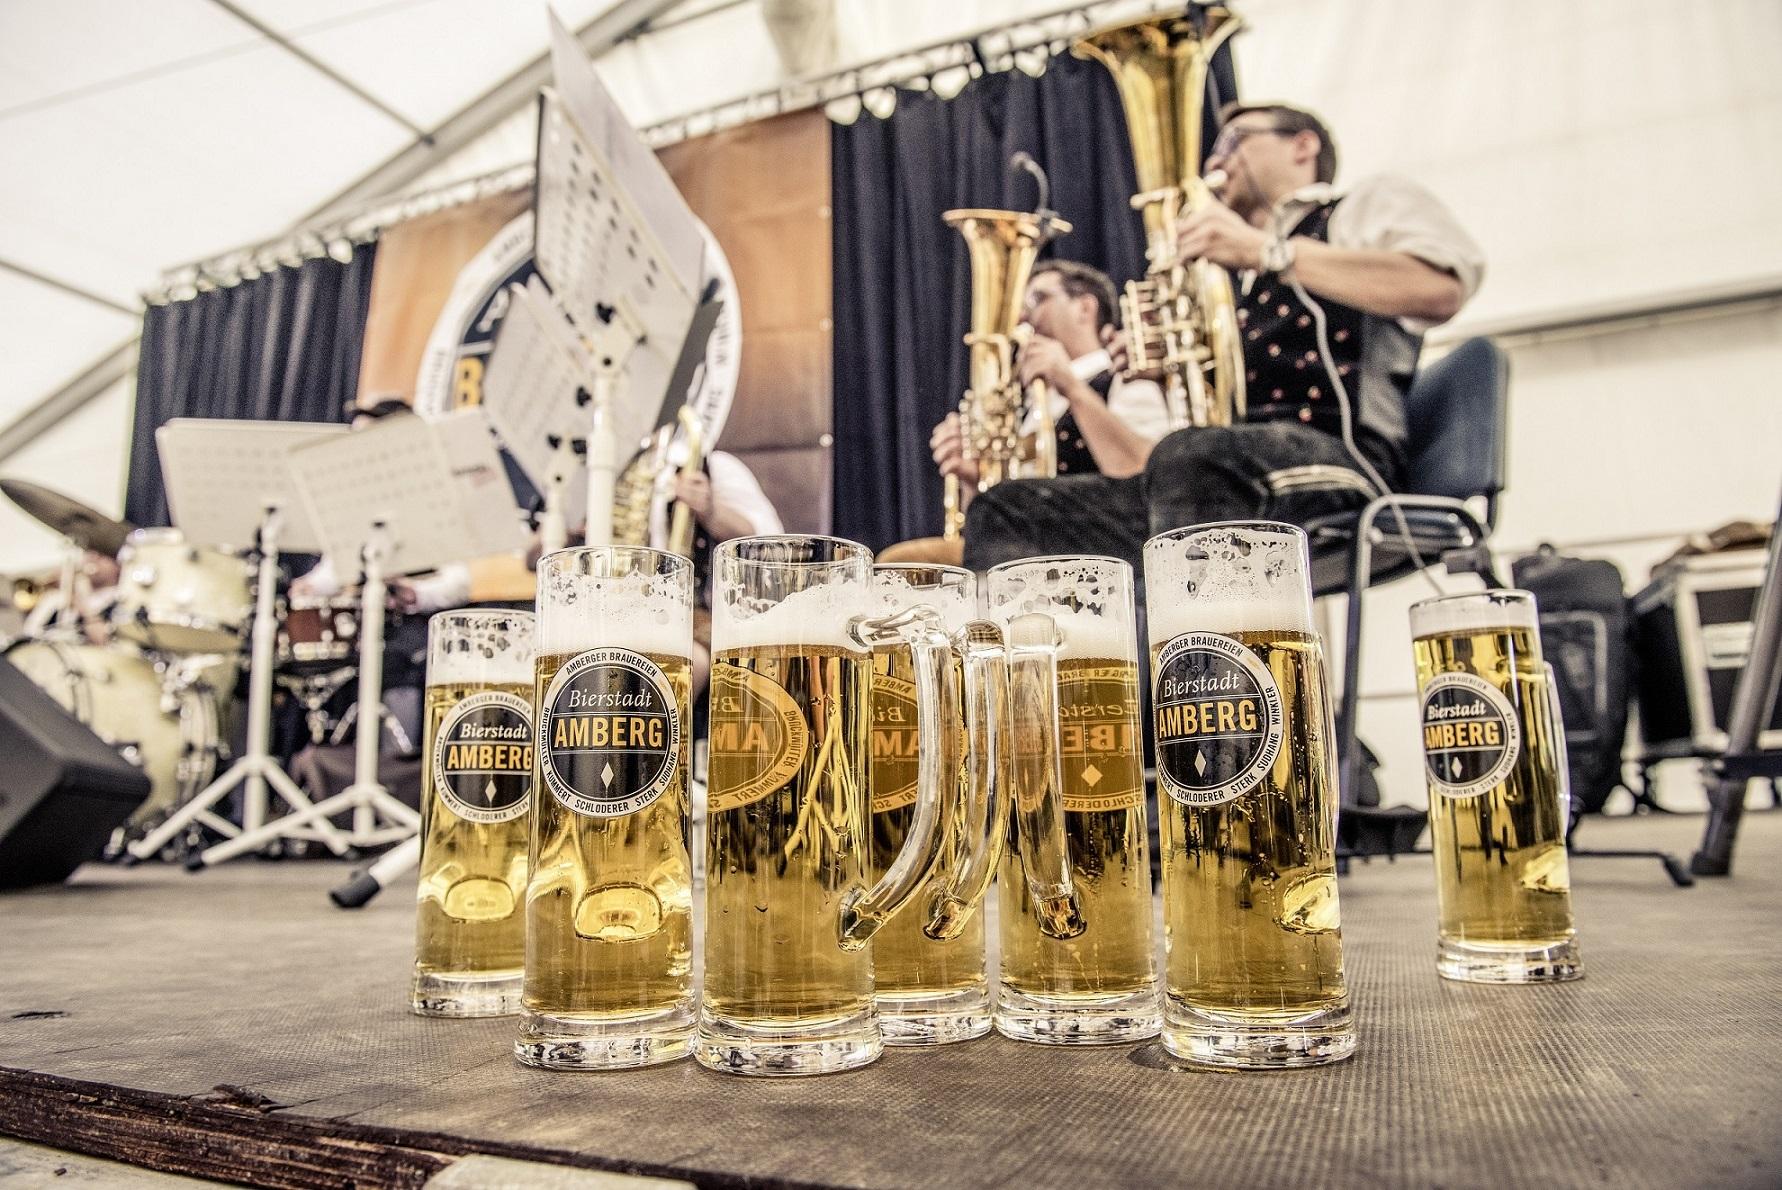 Bierfest Amberg